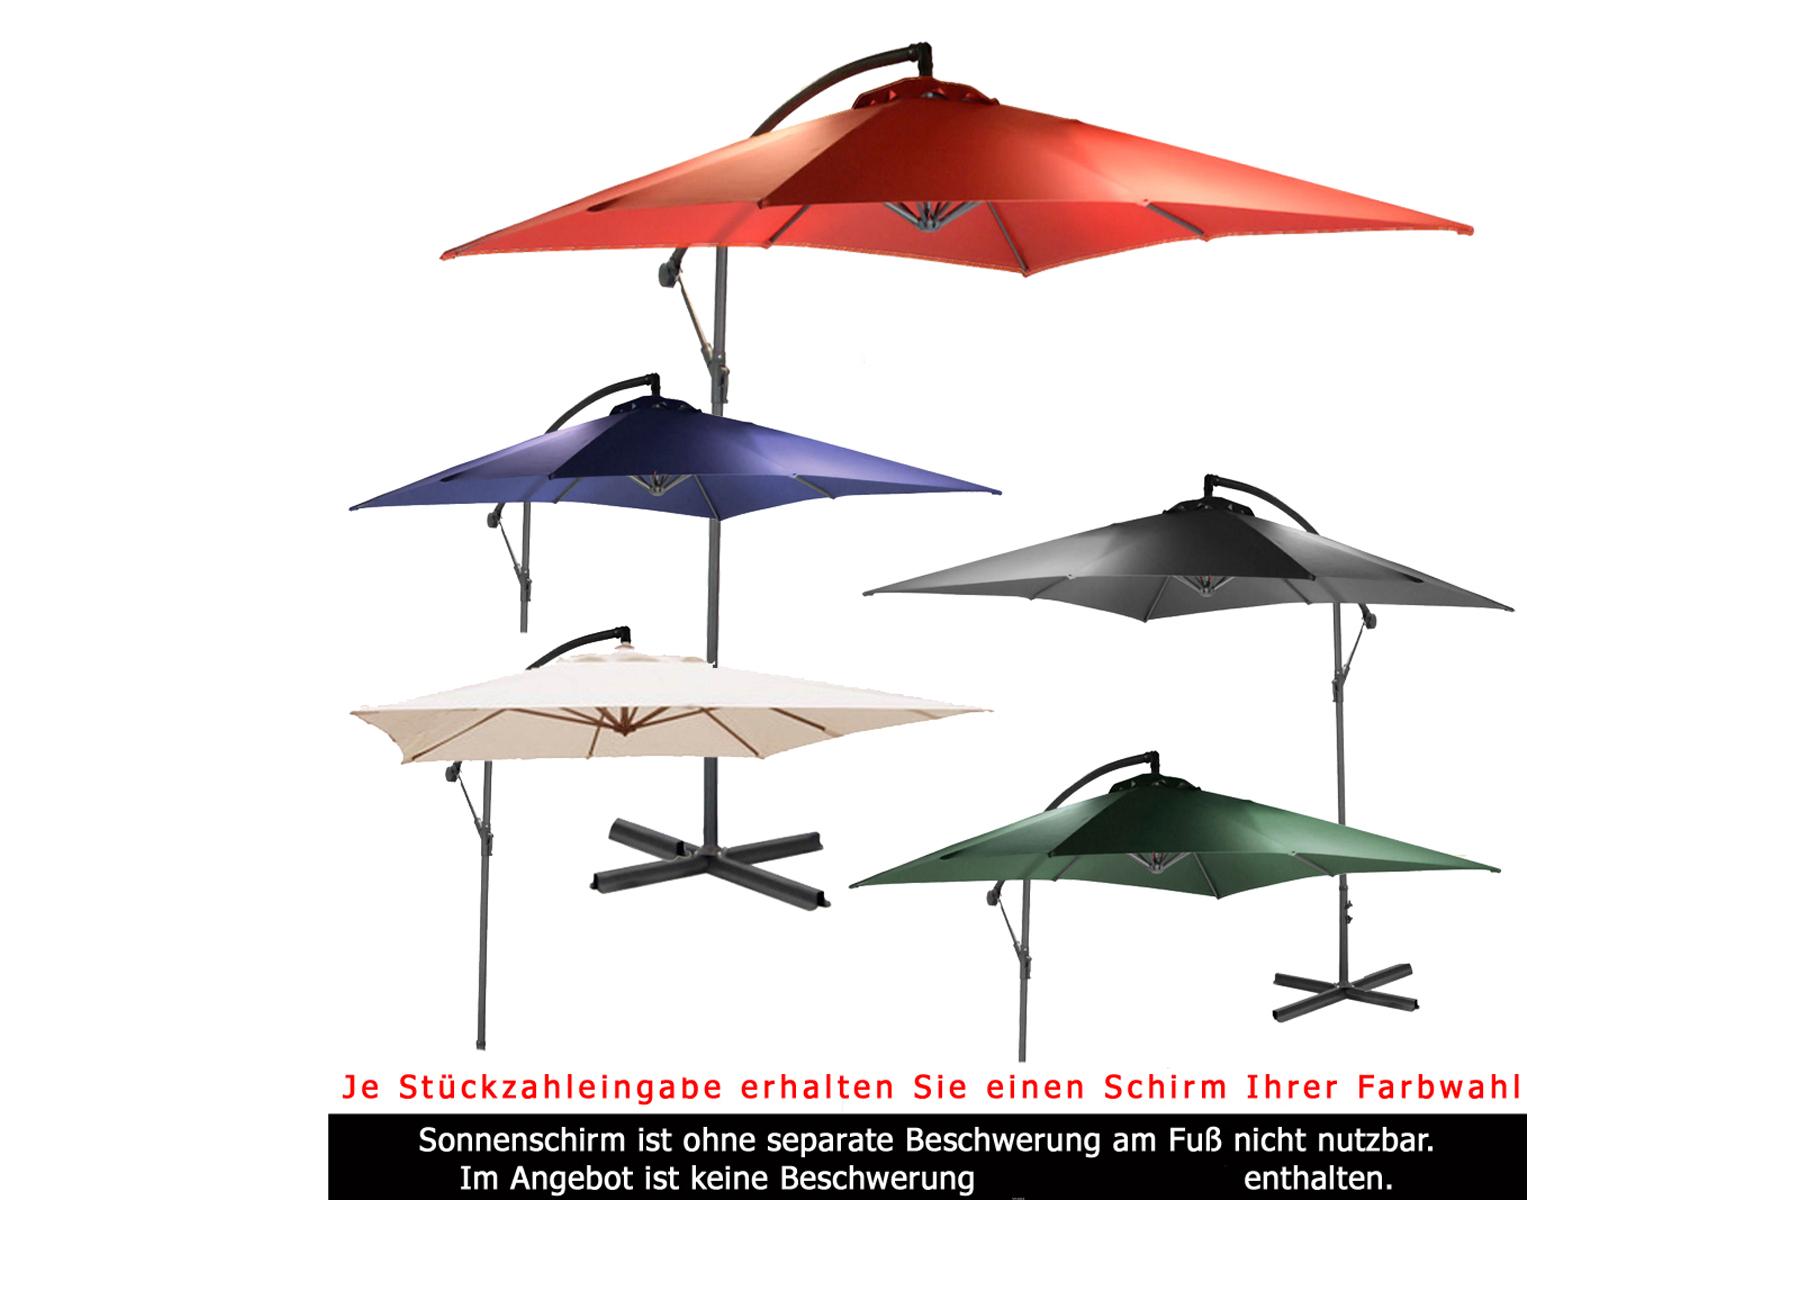 2 5m ampelschirm eckig sonnenschirm kurbelschirm schirm gartenschirm ca 250cm ebay. Black Bedroom Furniture Sets. Home Design Ideas